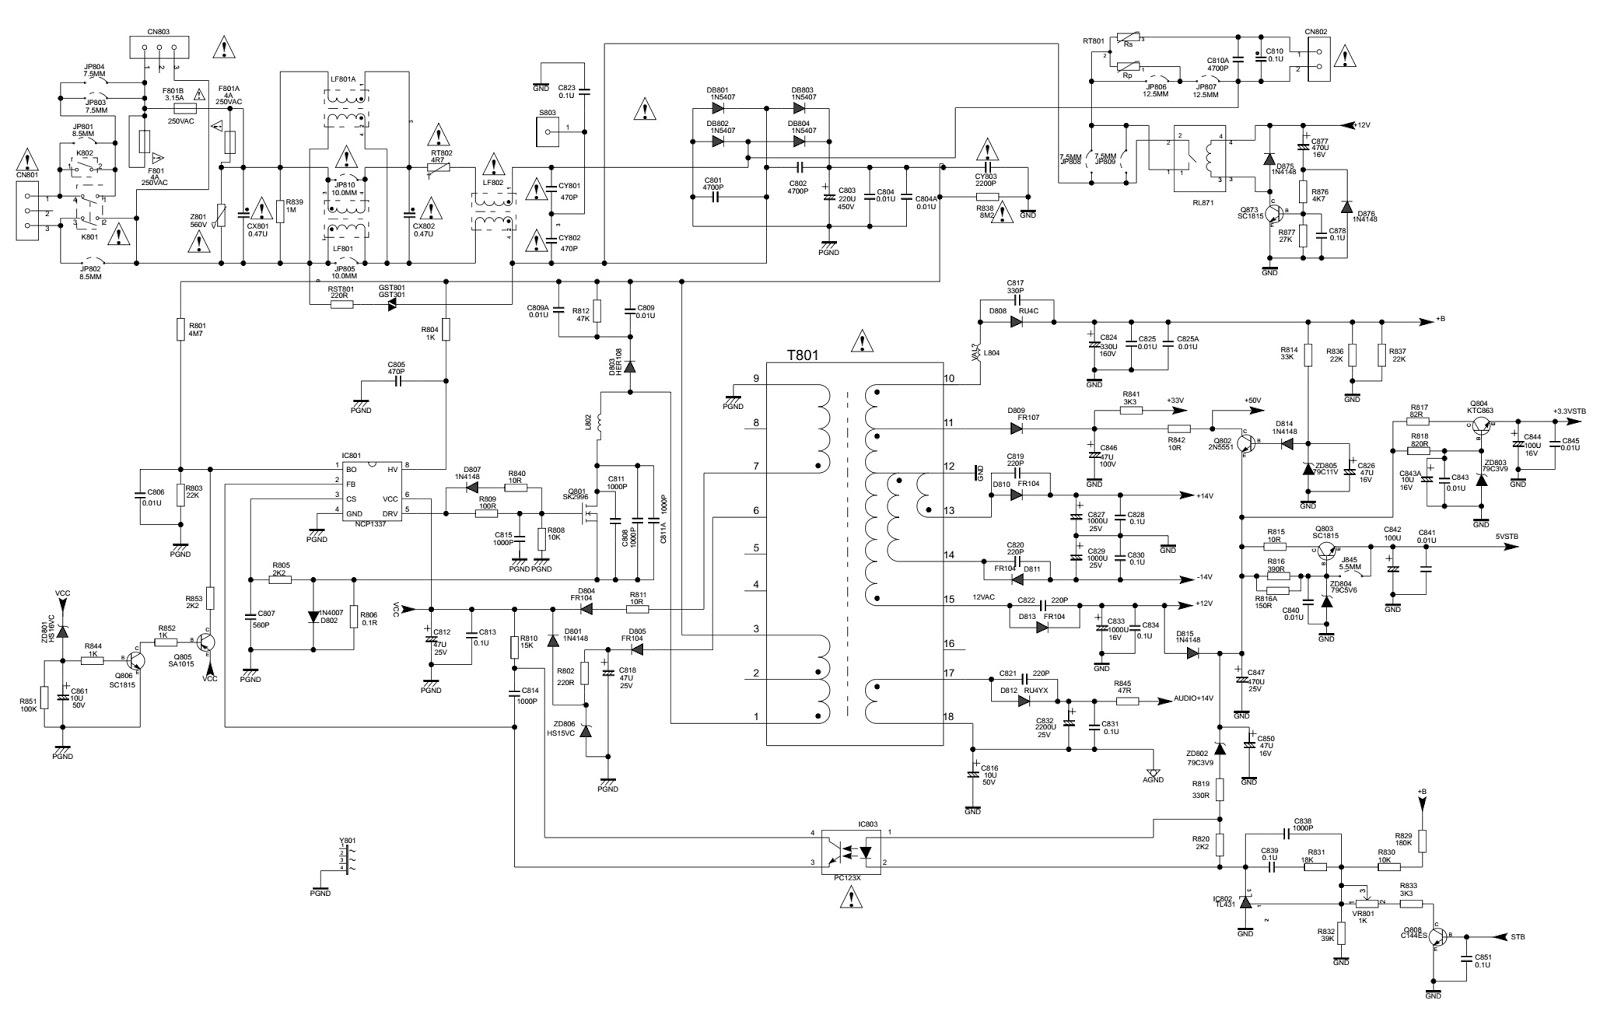 SMPS philco transformer wire color diagram wiring diagrams mars 50327 transformer wire diagram at cos-gaming.co